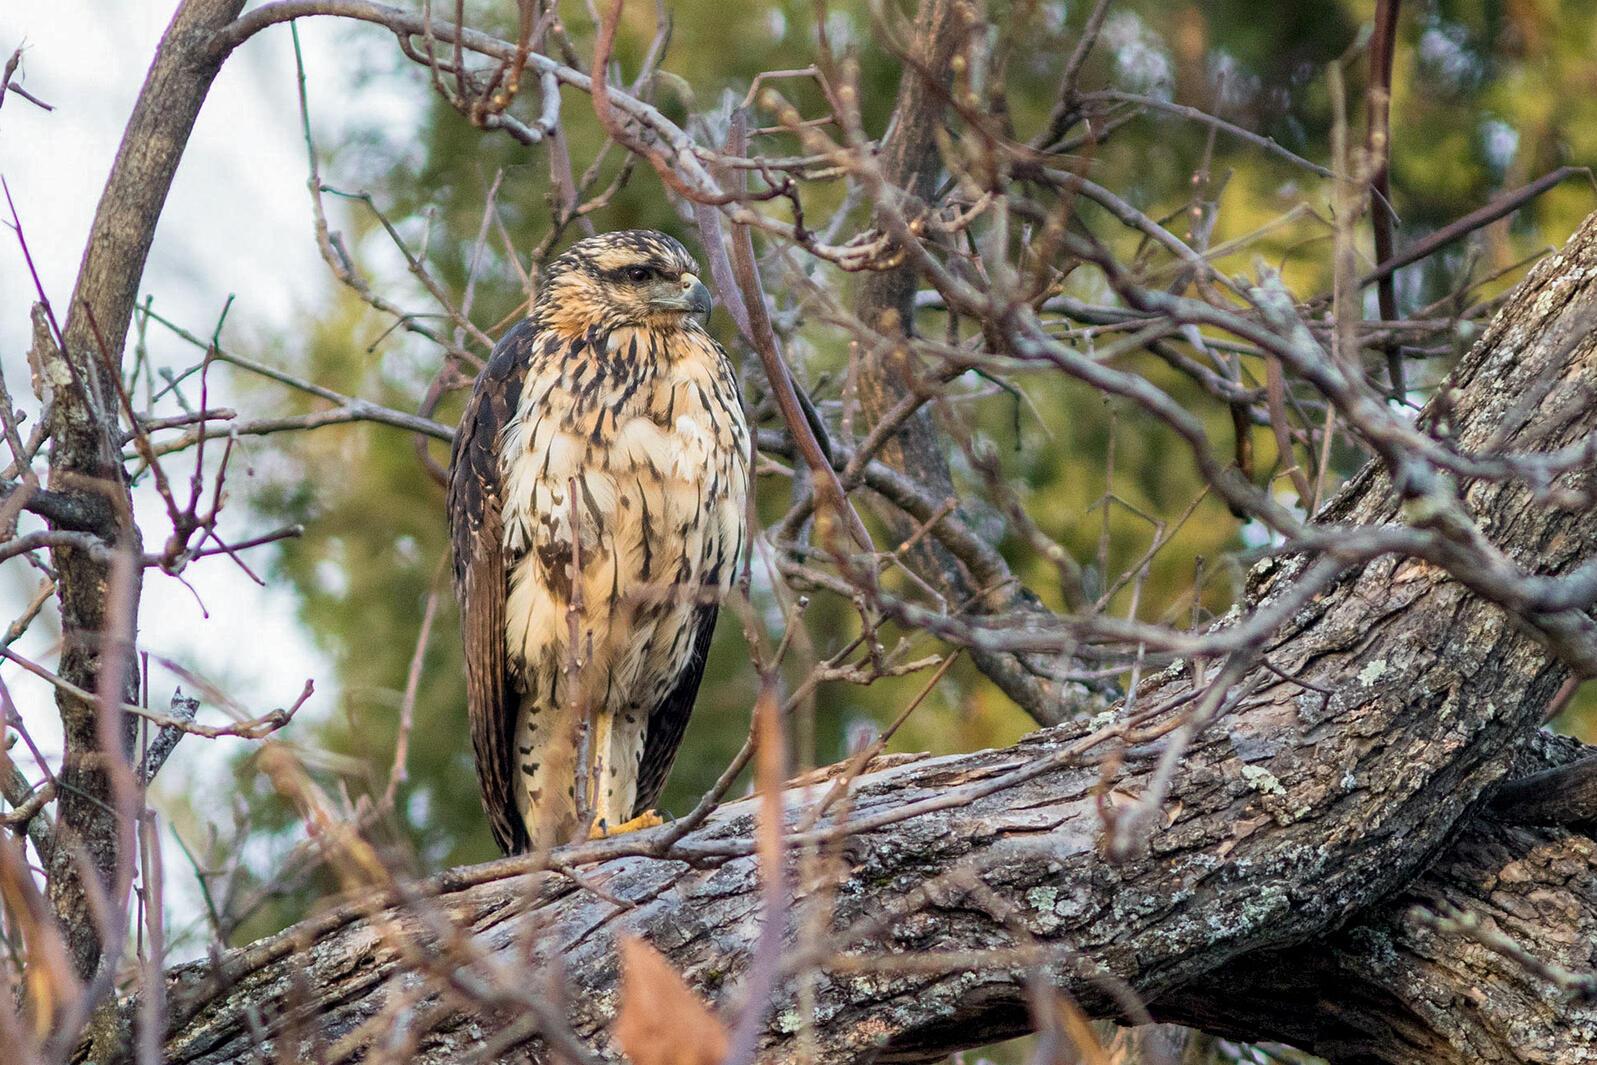 Christmas Bird Count Results Pittsburgh 2020 The 119th Christmas Bird Count Summary | Audubon